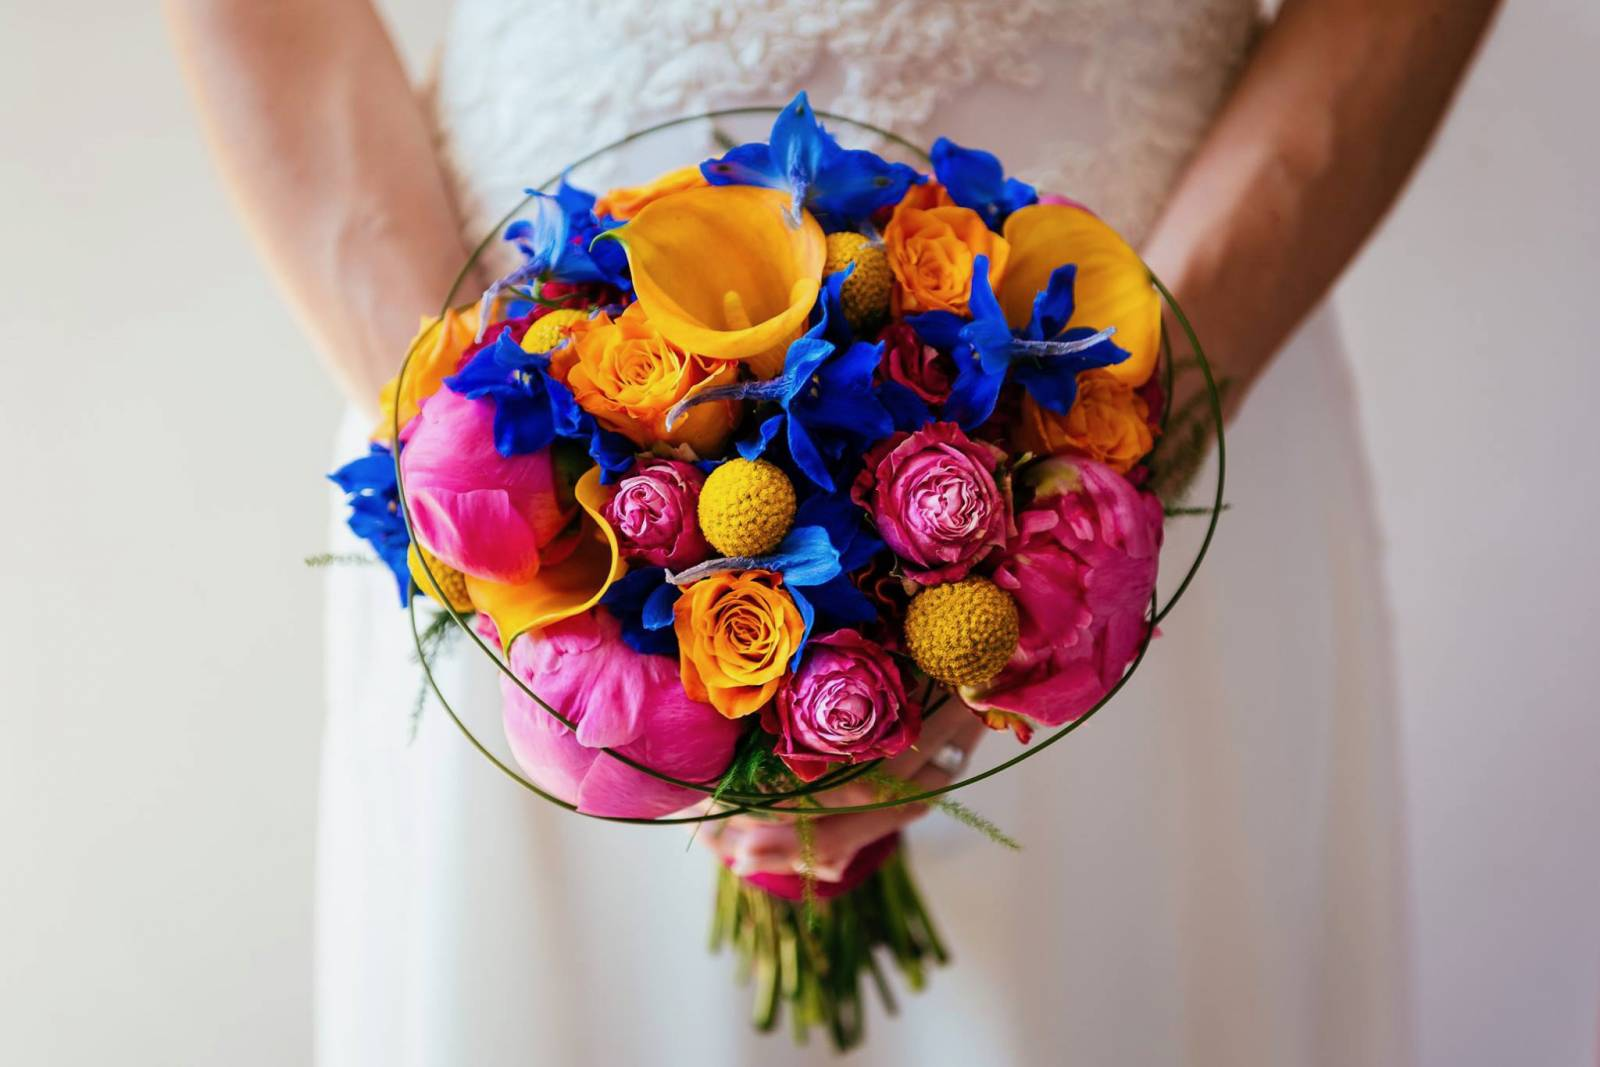 Excellence Weddings - House of Weddings - Stijn knaepen2